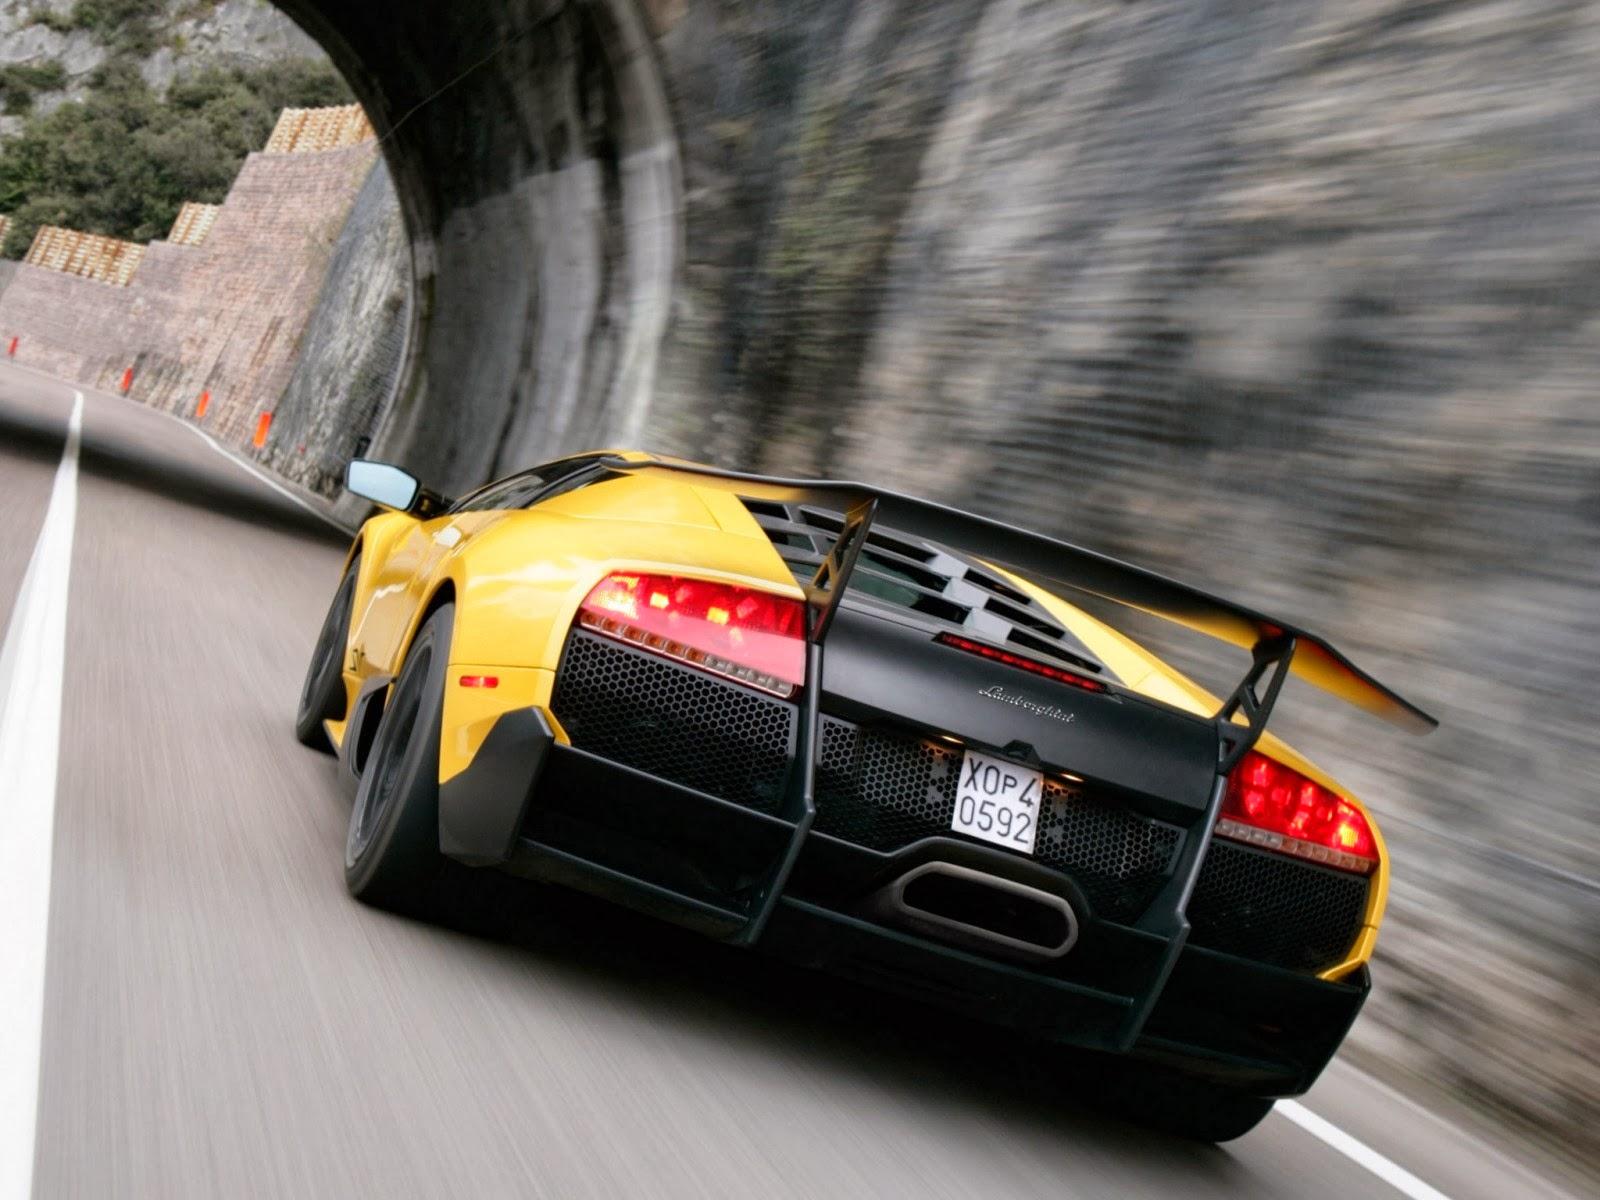 "<img src=""http://1.bp.blogspot.com/-R3cHgDLHuR8/Uu1UCoIYKFI/AAAAAAAAK0U/M6VipSXxNeI/s1600/lamborghini-lp-superveloce-wallpaper.jpg"" alt=""Lamborghini wallpaper"" />"